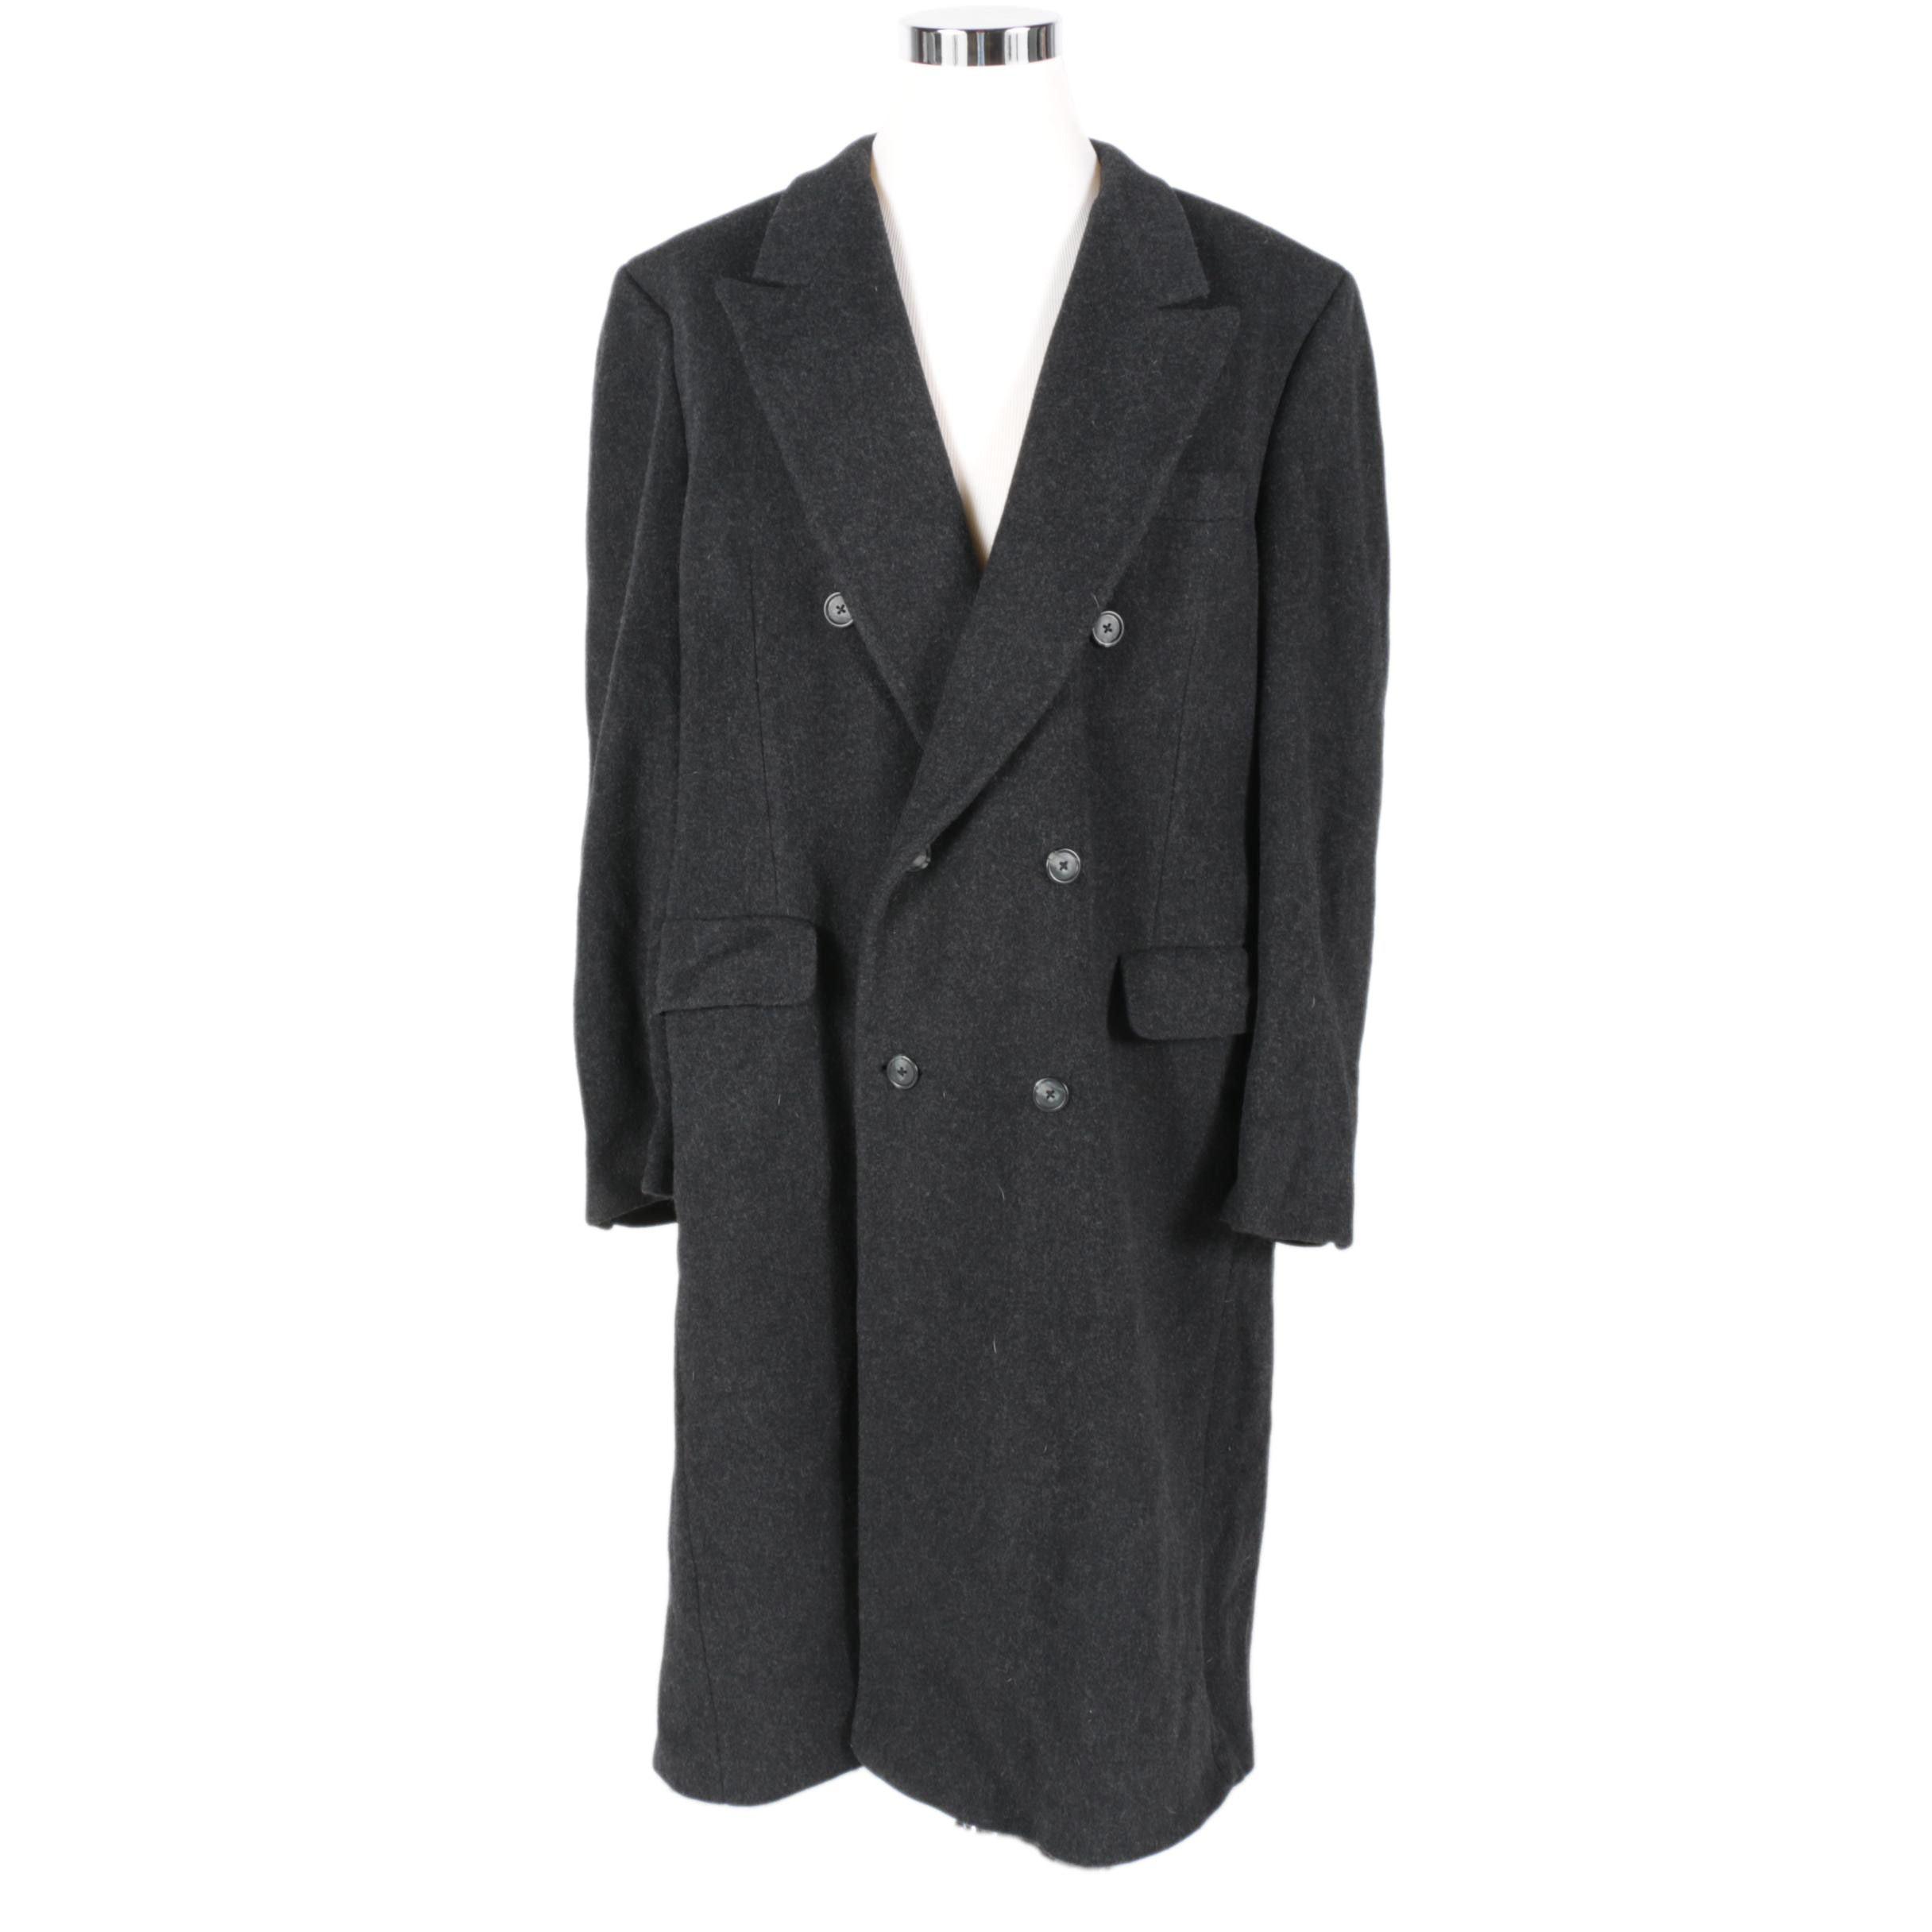 Christian Dior Monsieur Black Wool Coat